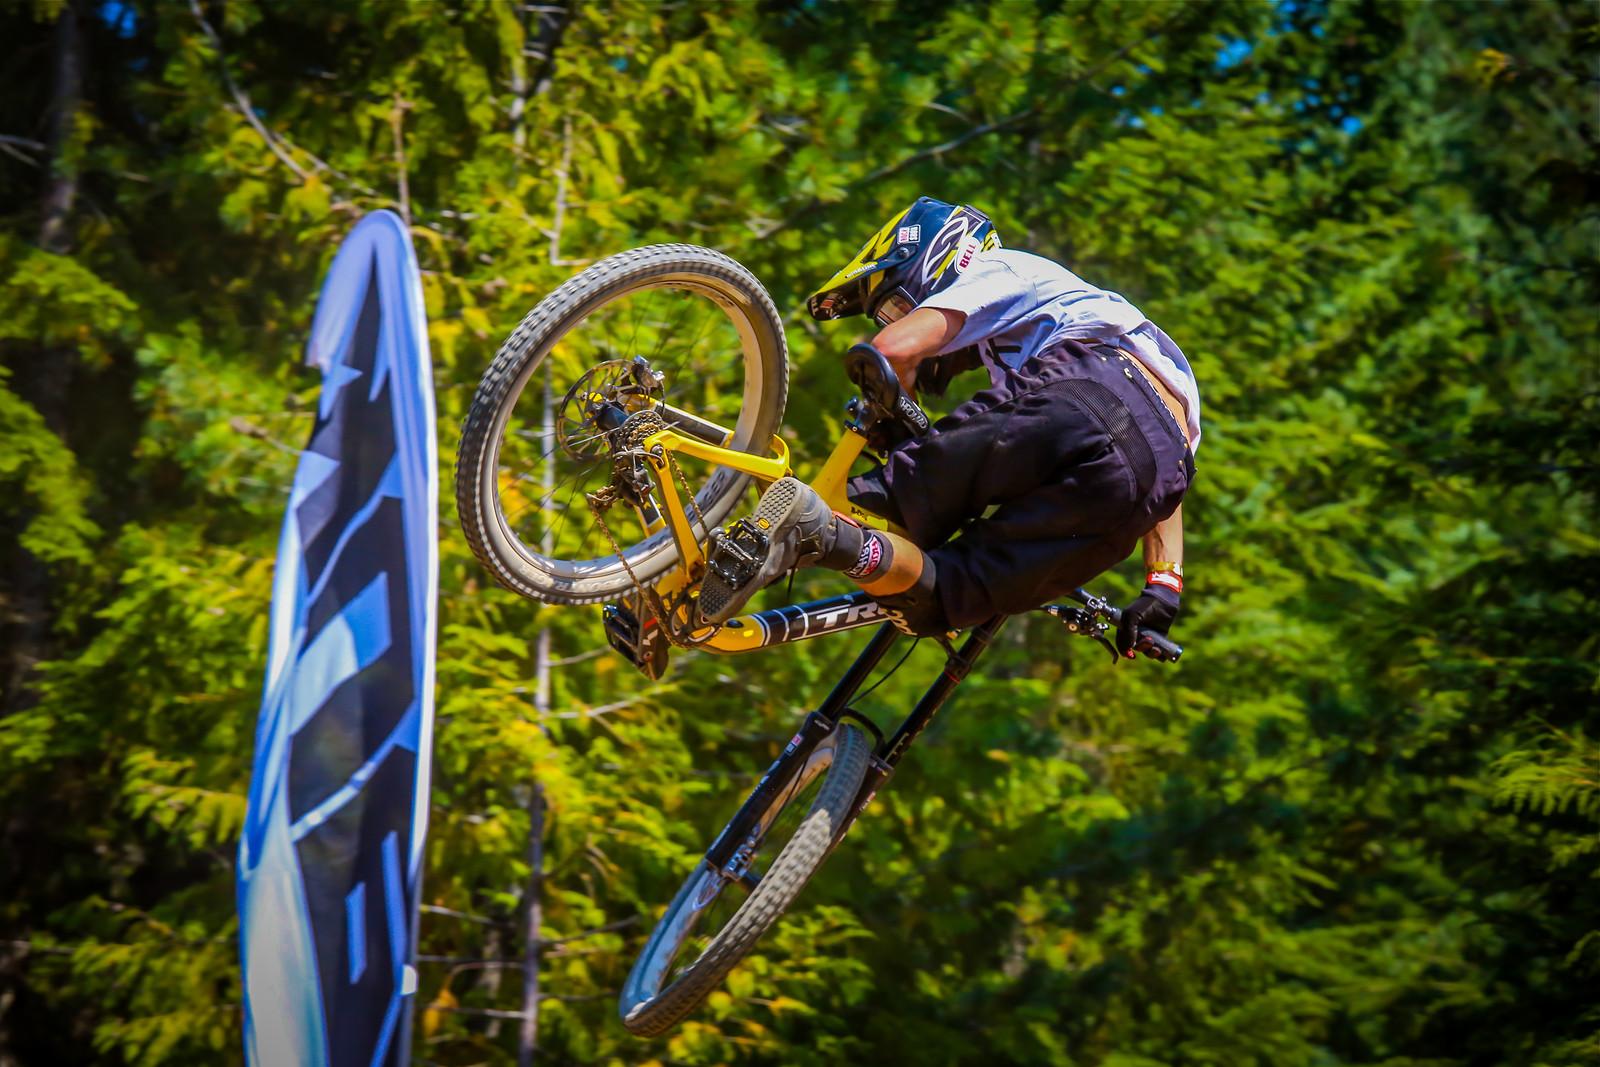 R-Dog Whip Good - Malcolm Mclaws - Mountain Biking Pictures - Vital MTB